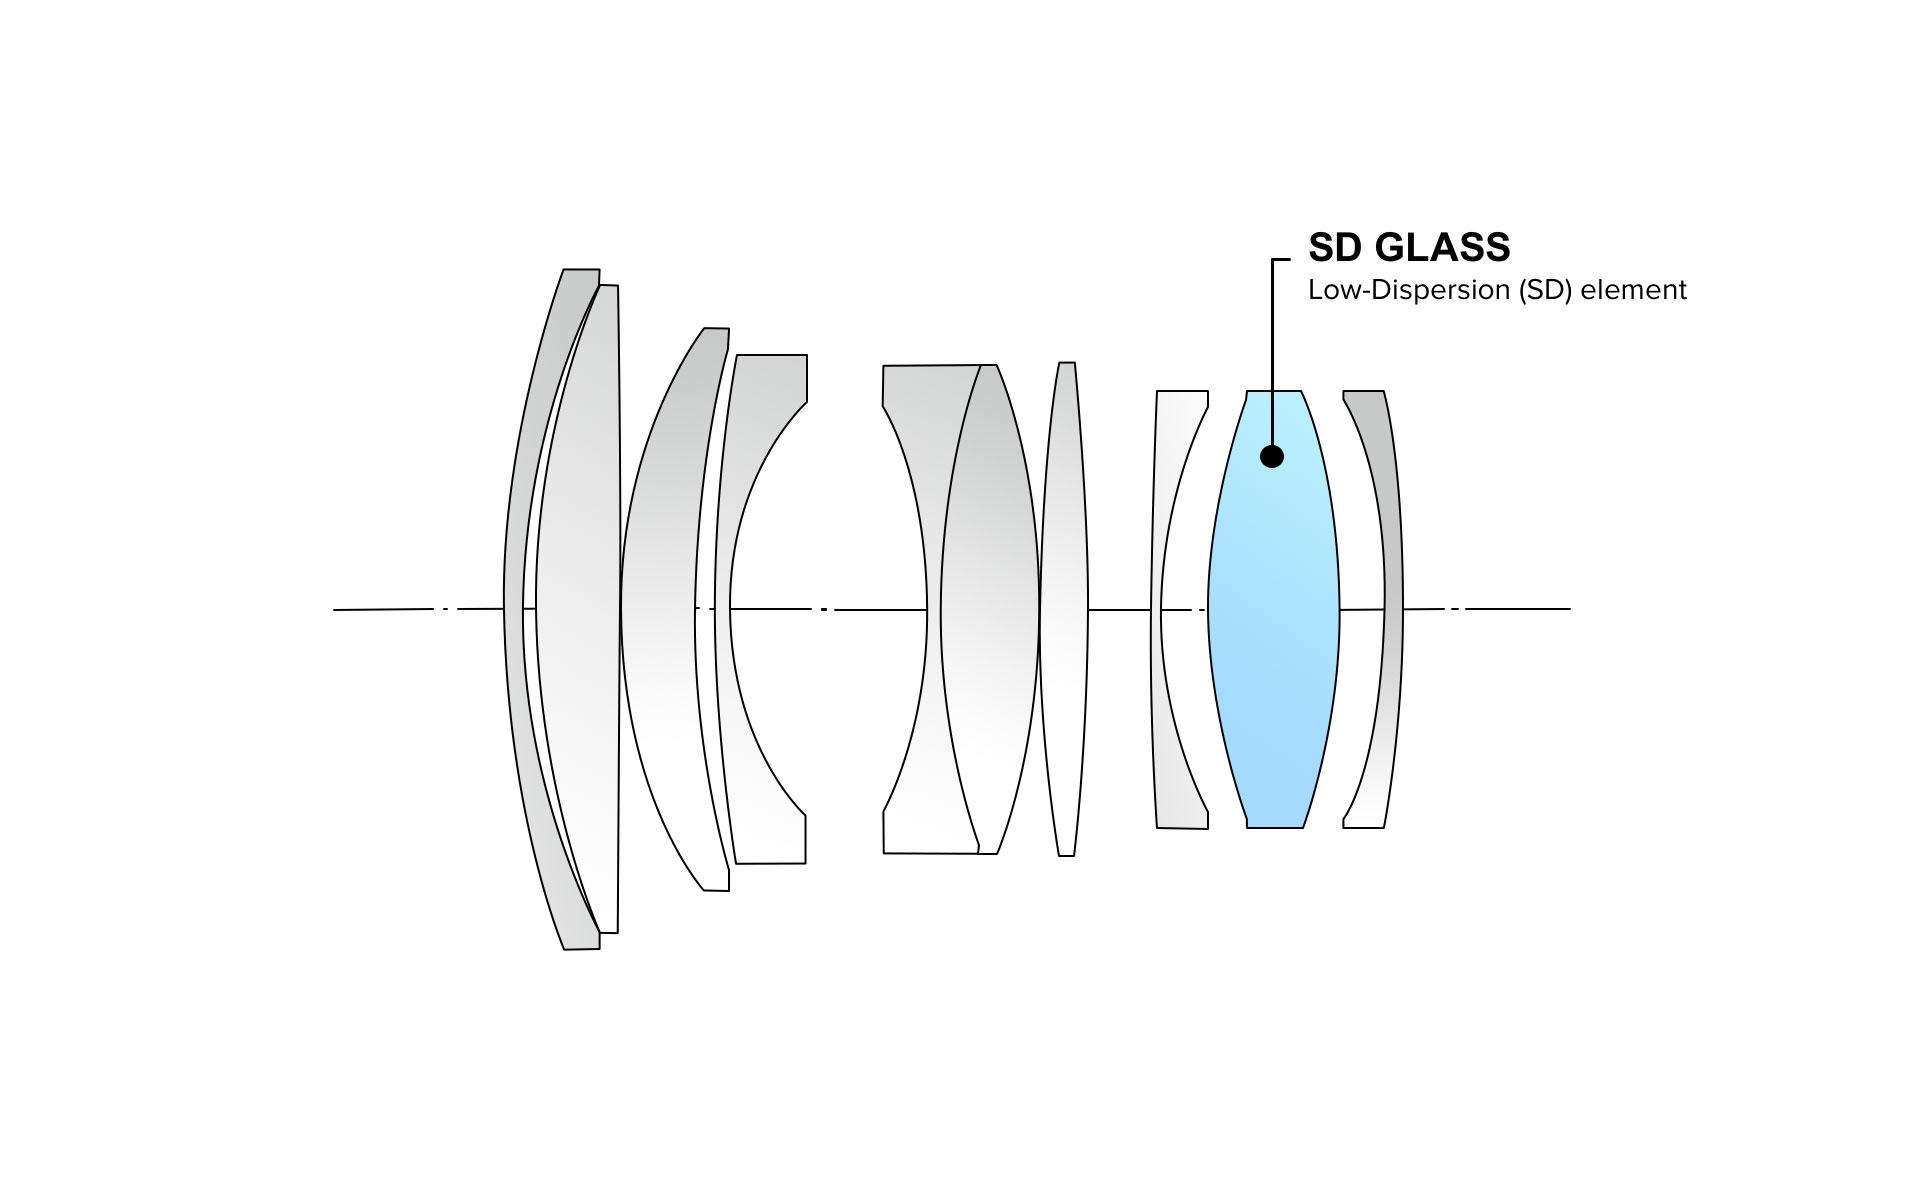 Оптическая схема объектива Tokina atx-m 56mm f/1.4 X